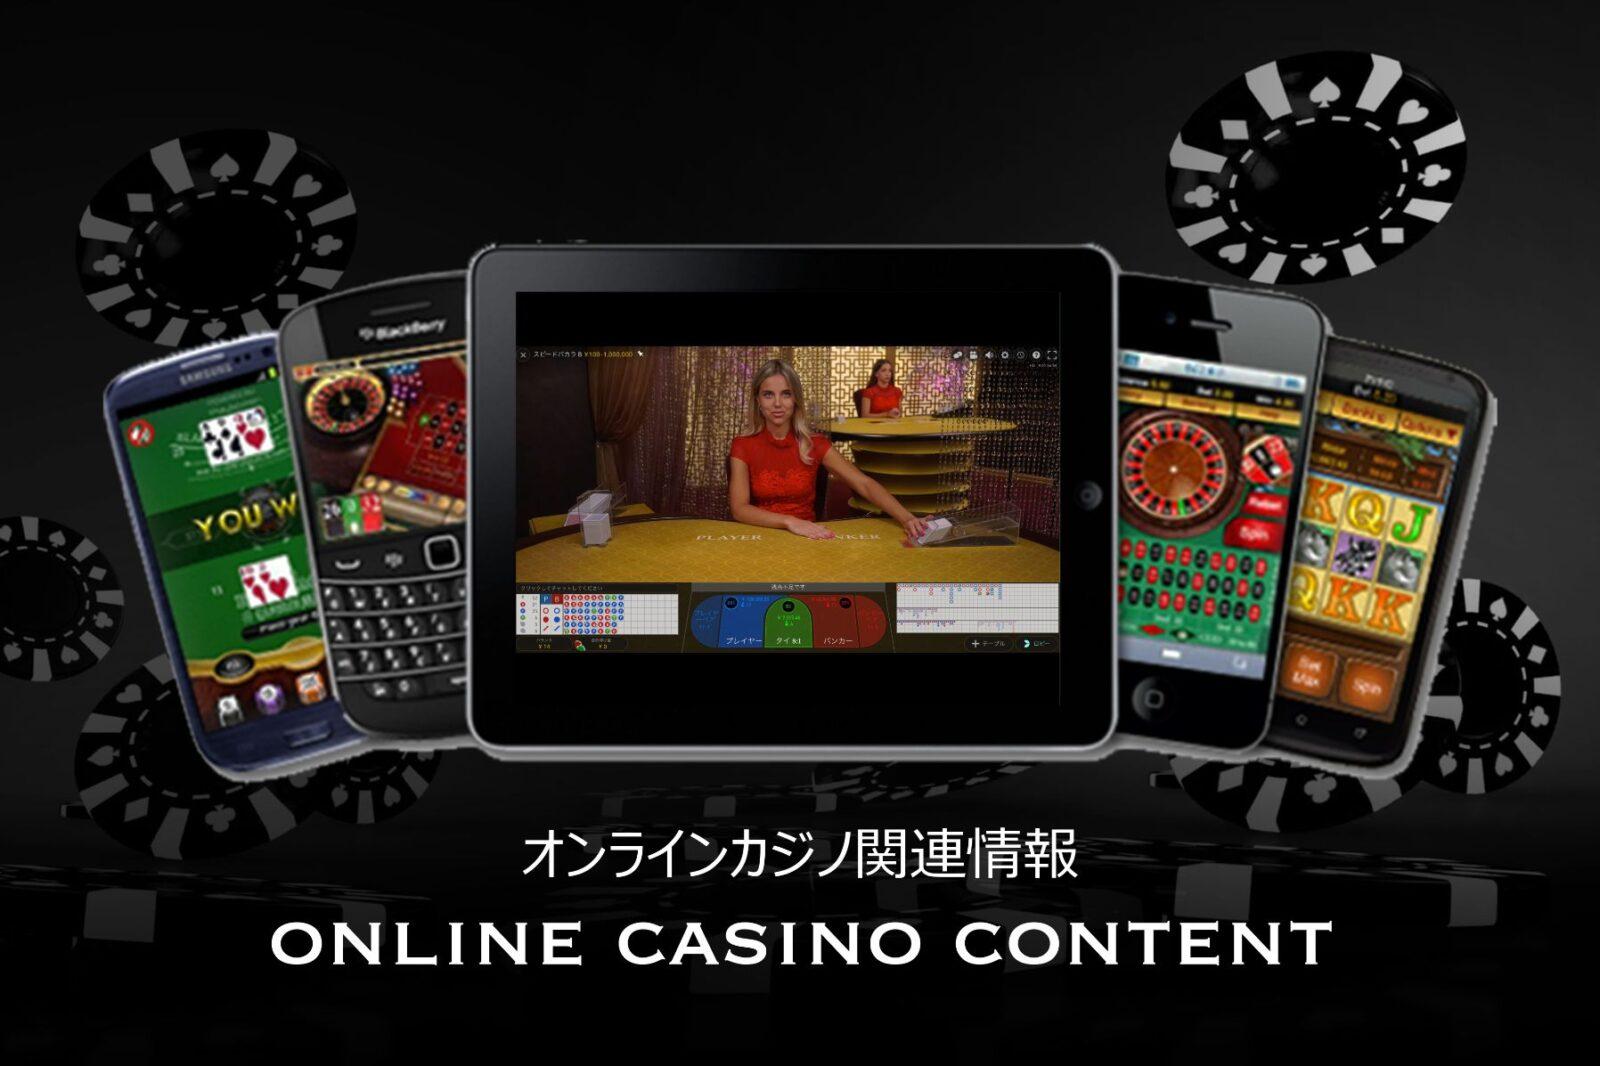 onlinecasino_content